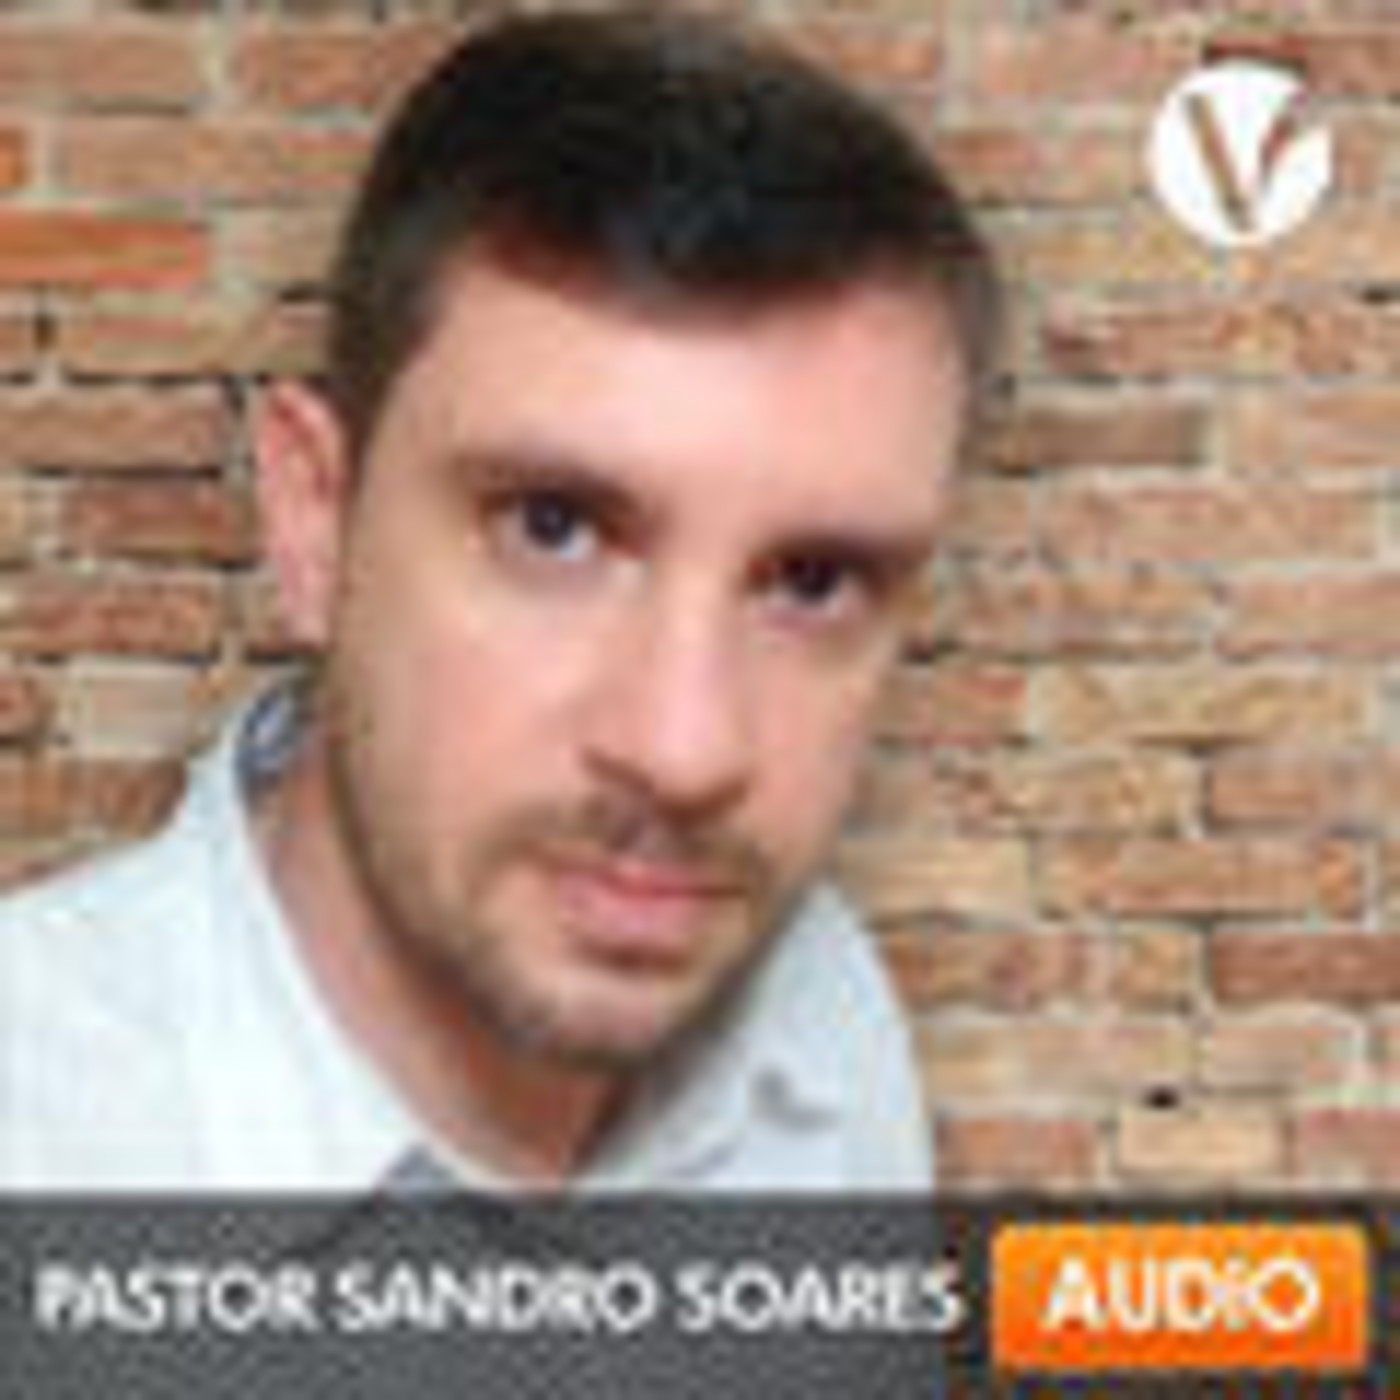 Pastor Sandro Soares